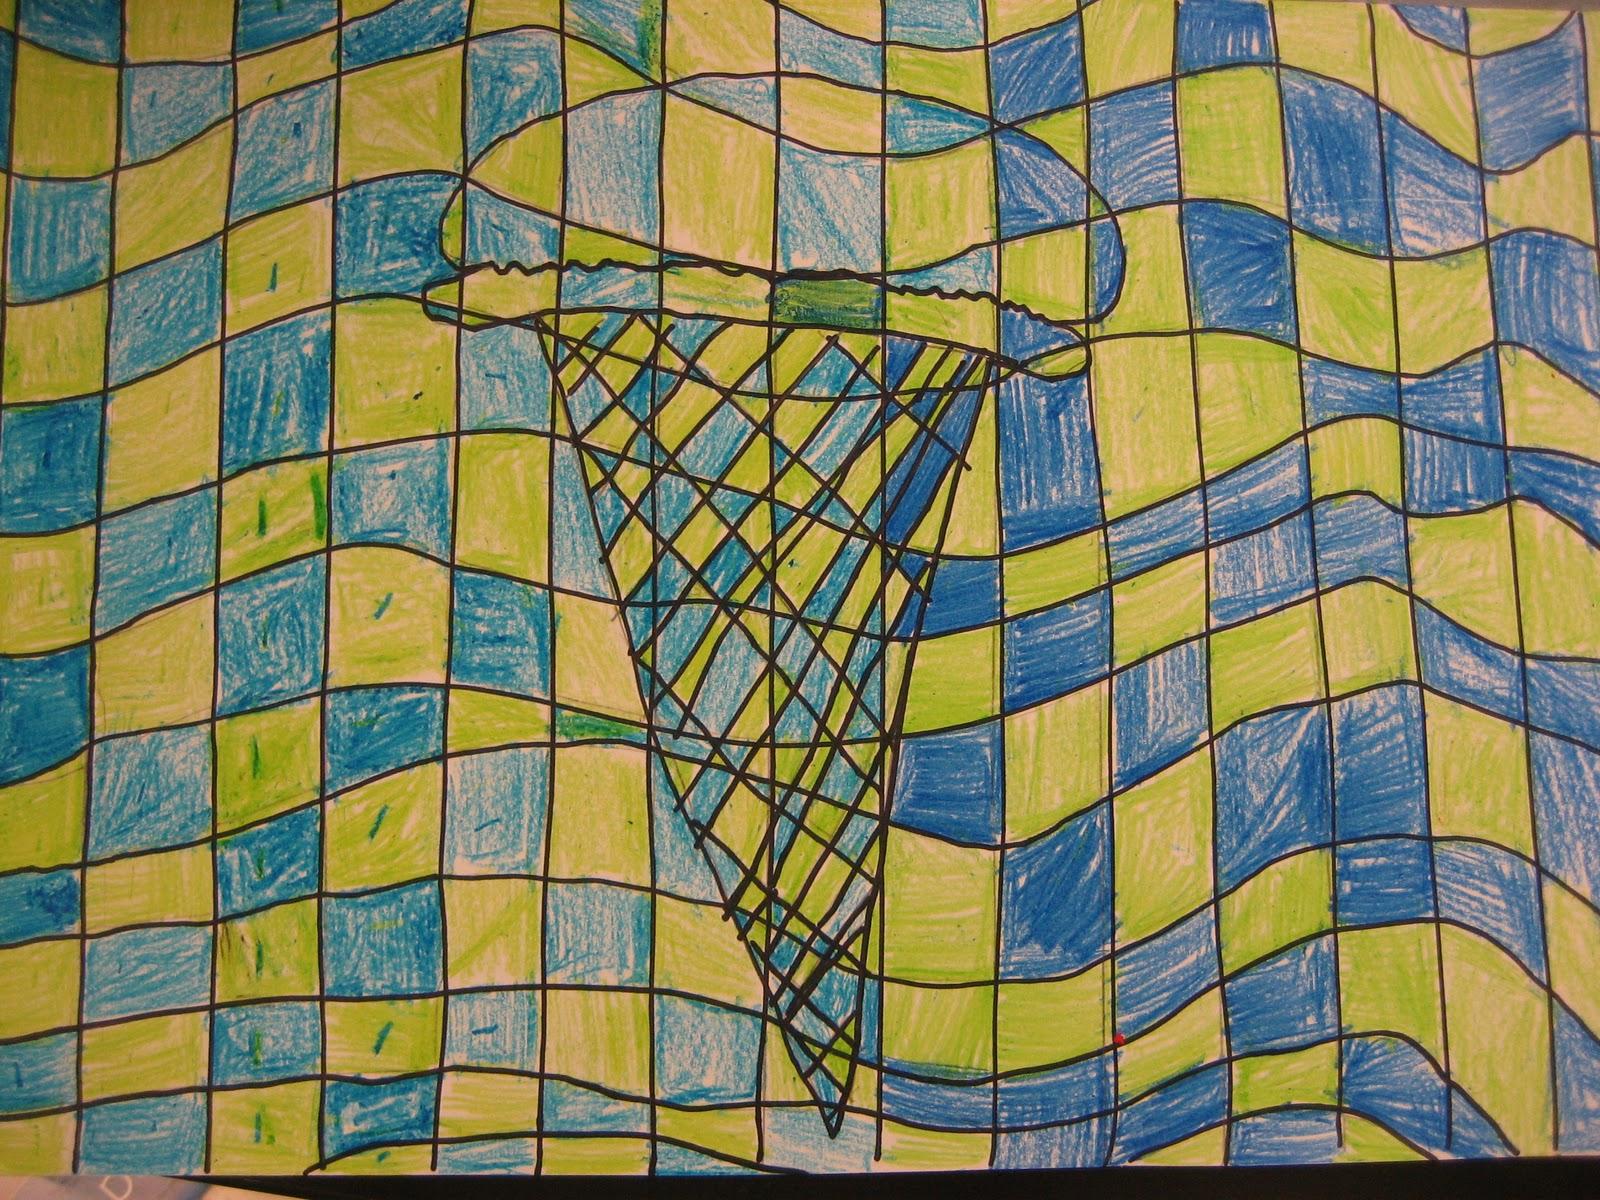 Creations from Young Minds: Third Grade: Op Art